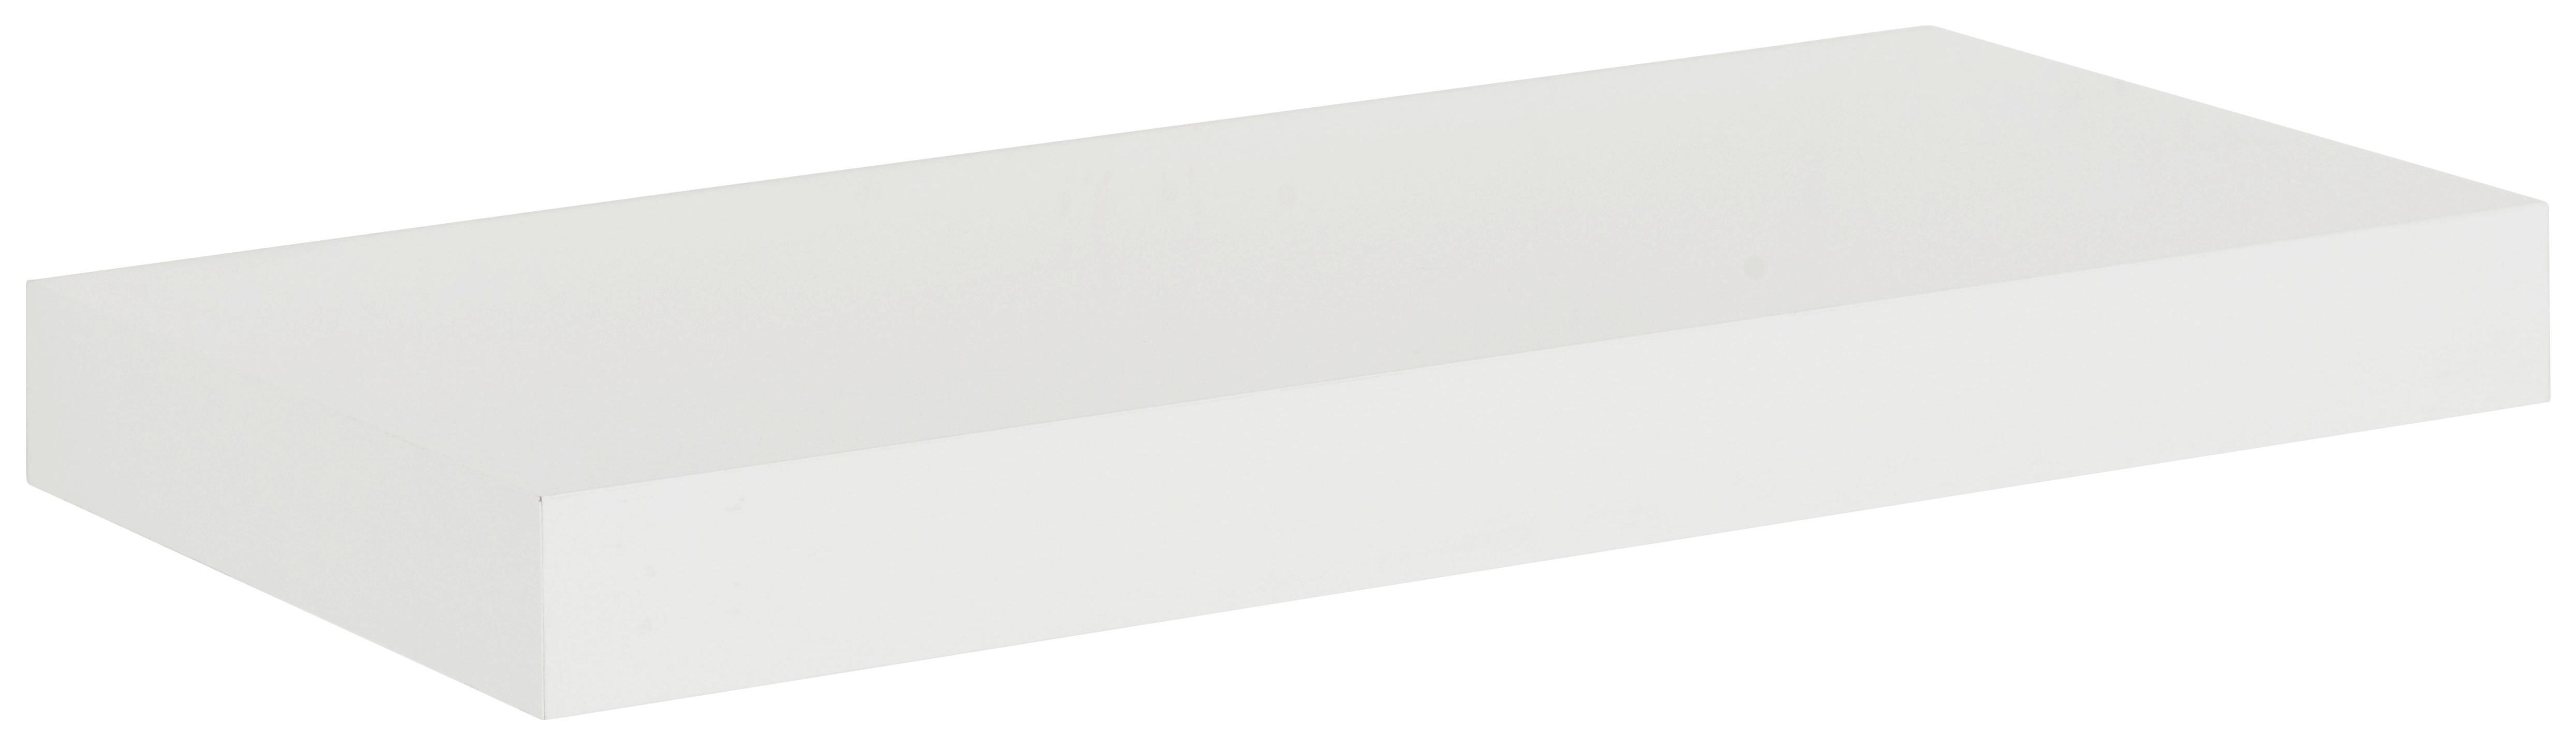 WANDBOARD Weiß - Weiß, Basics, Holz (100/4/24cm) - MÖMAX modern living